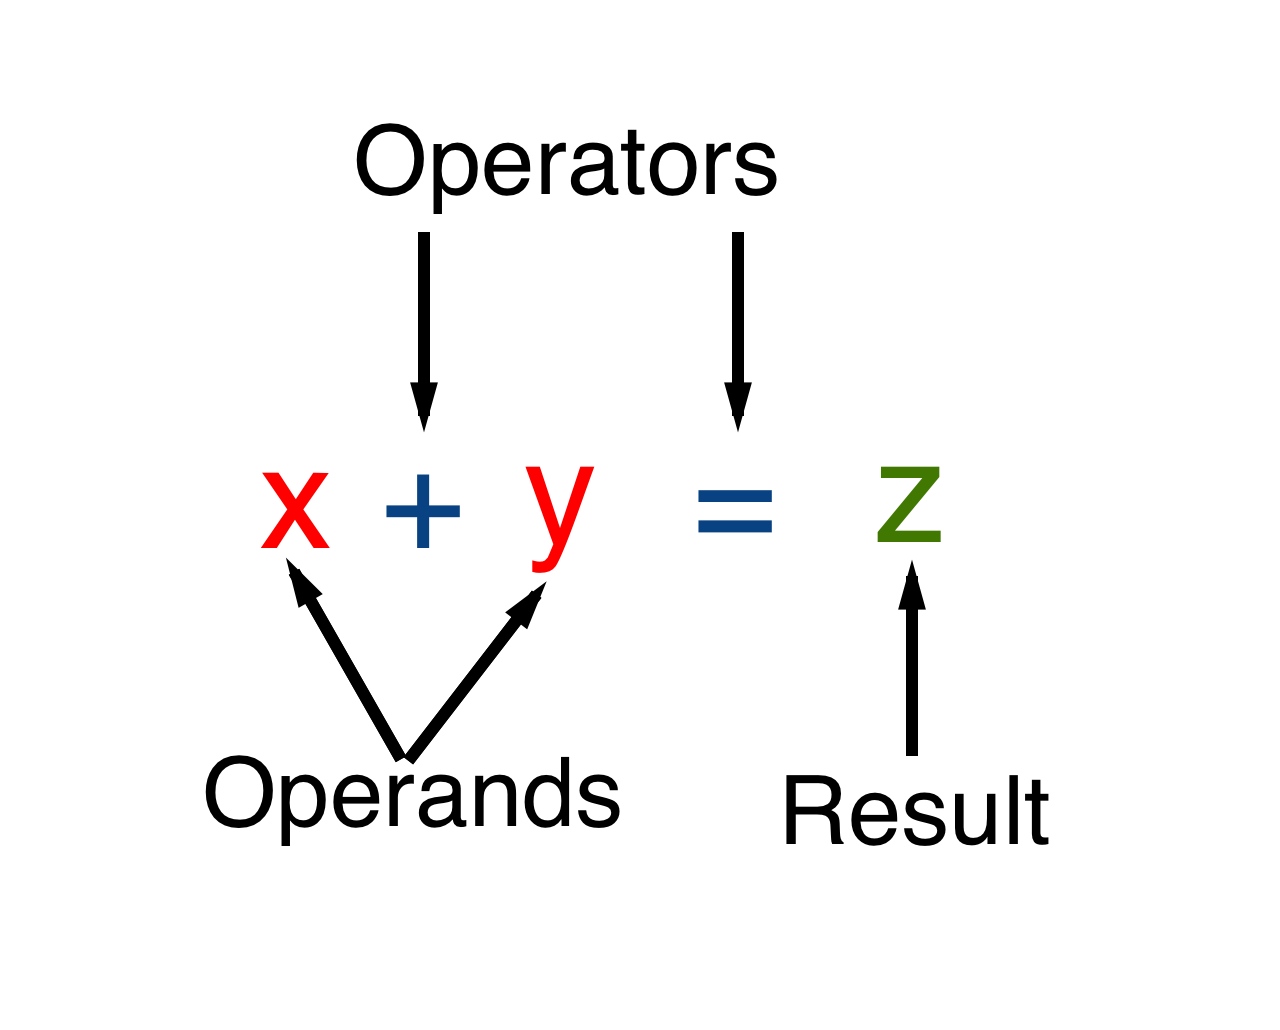 Operator-operand